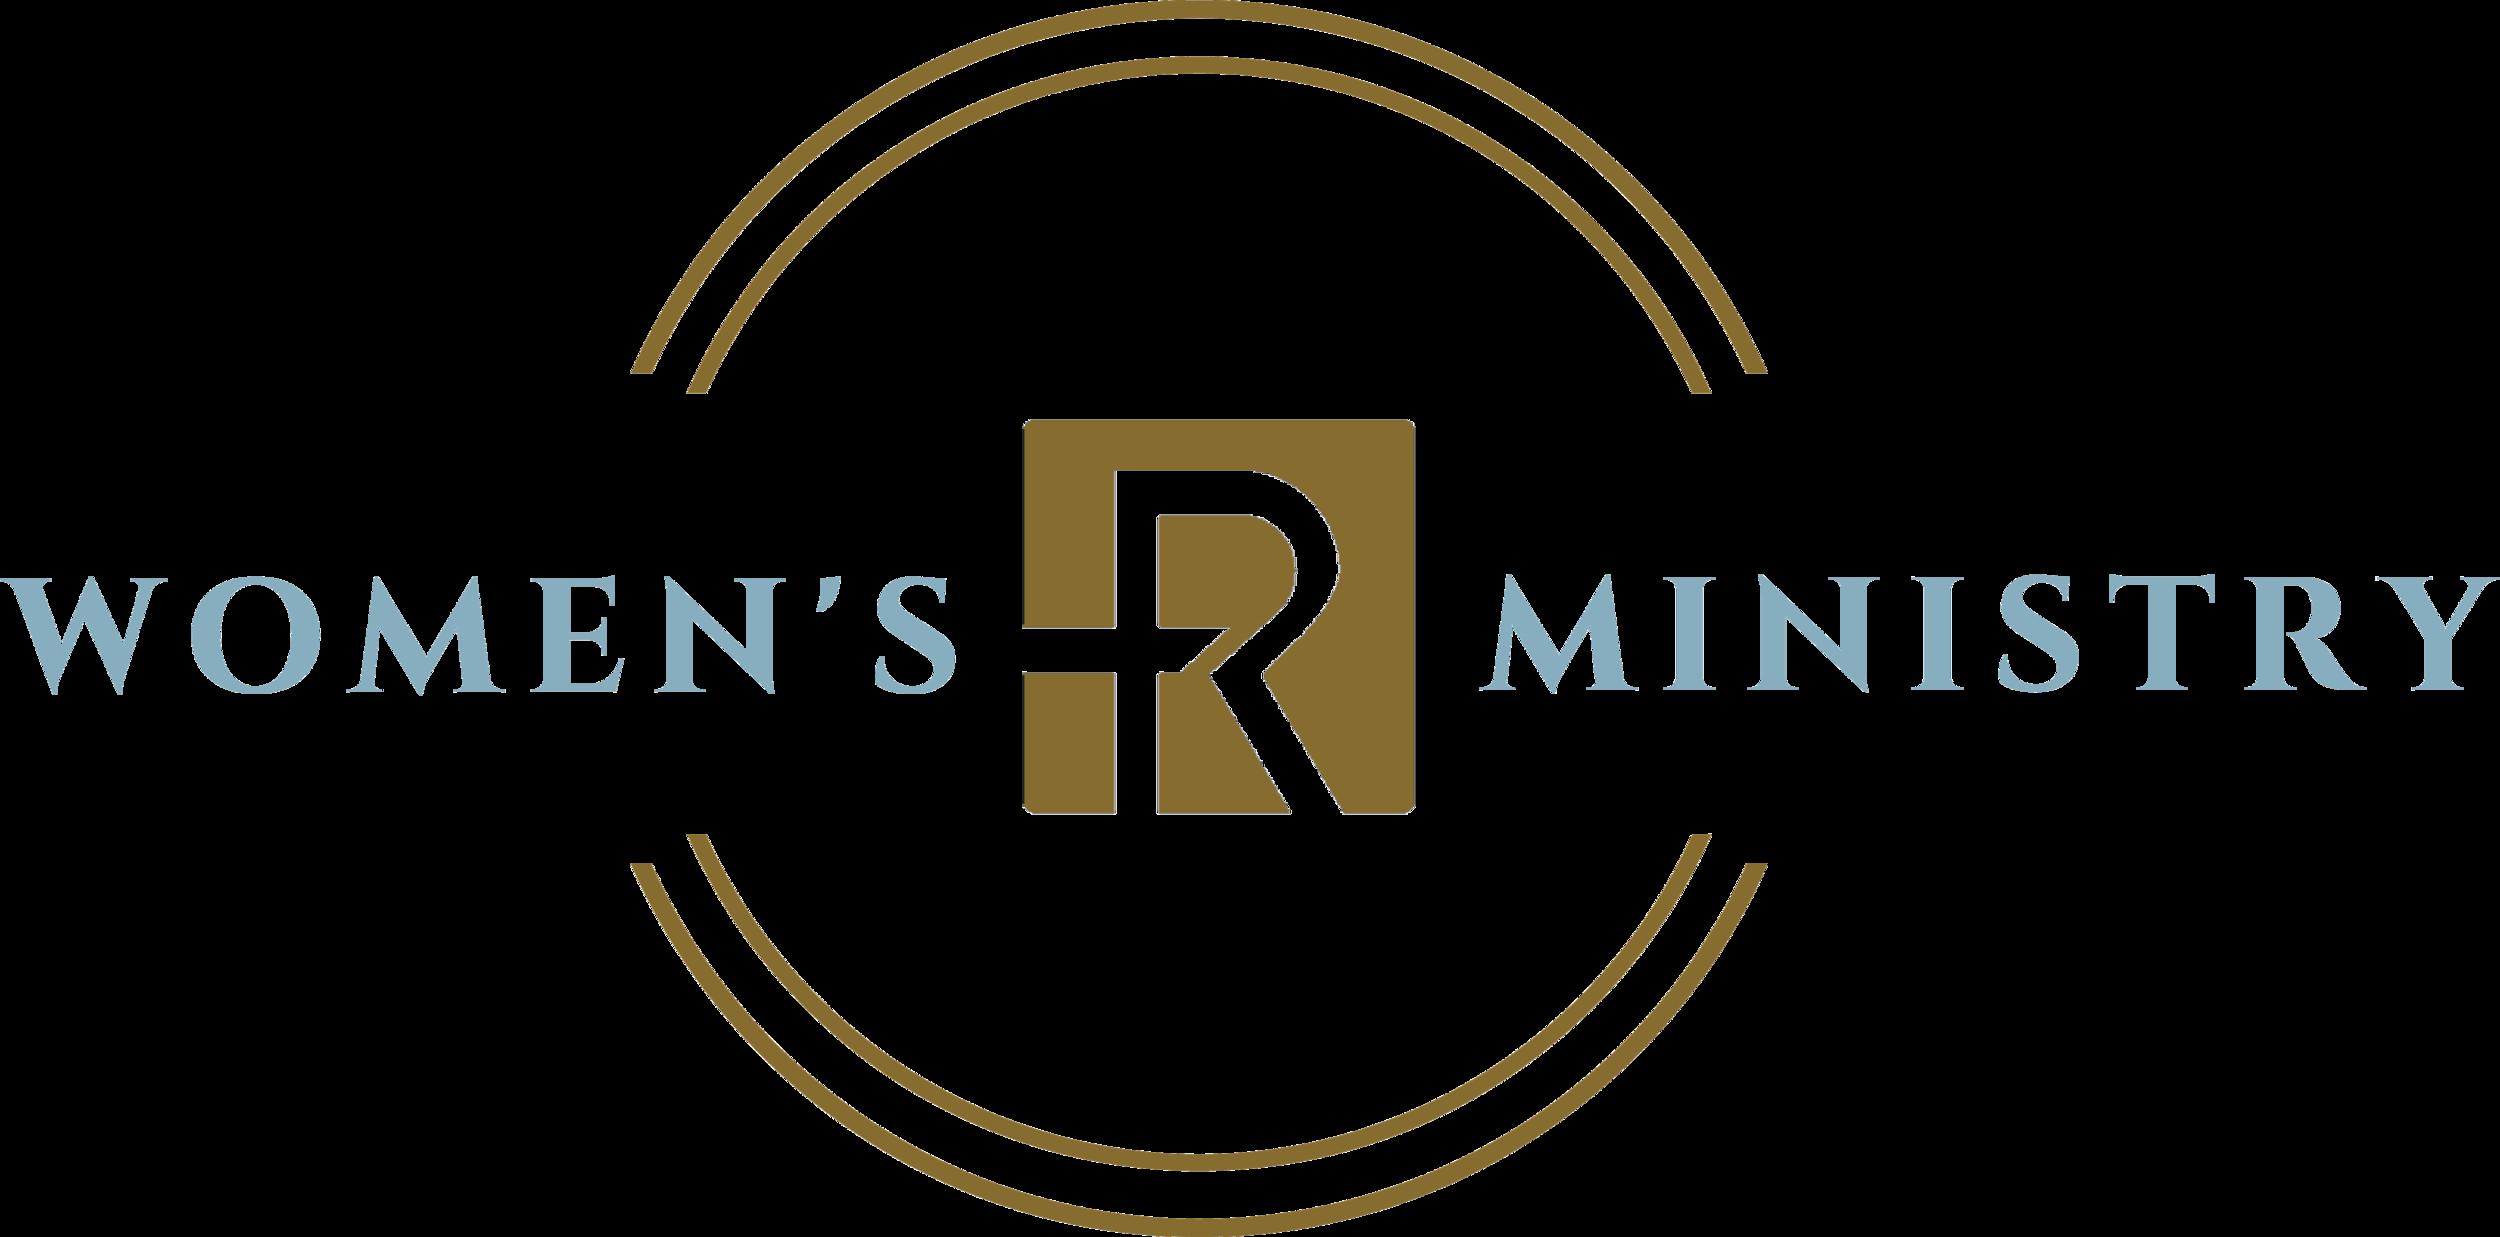 Rwomens_ministry_transparent.png